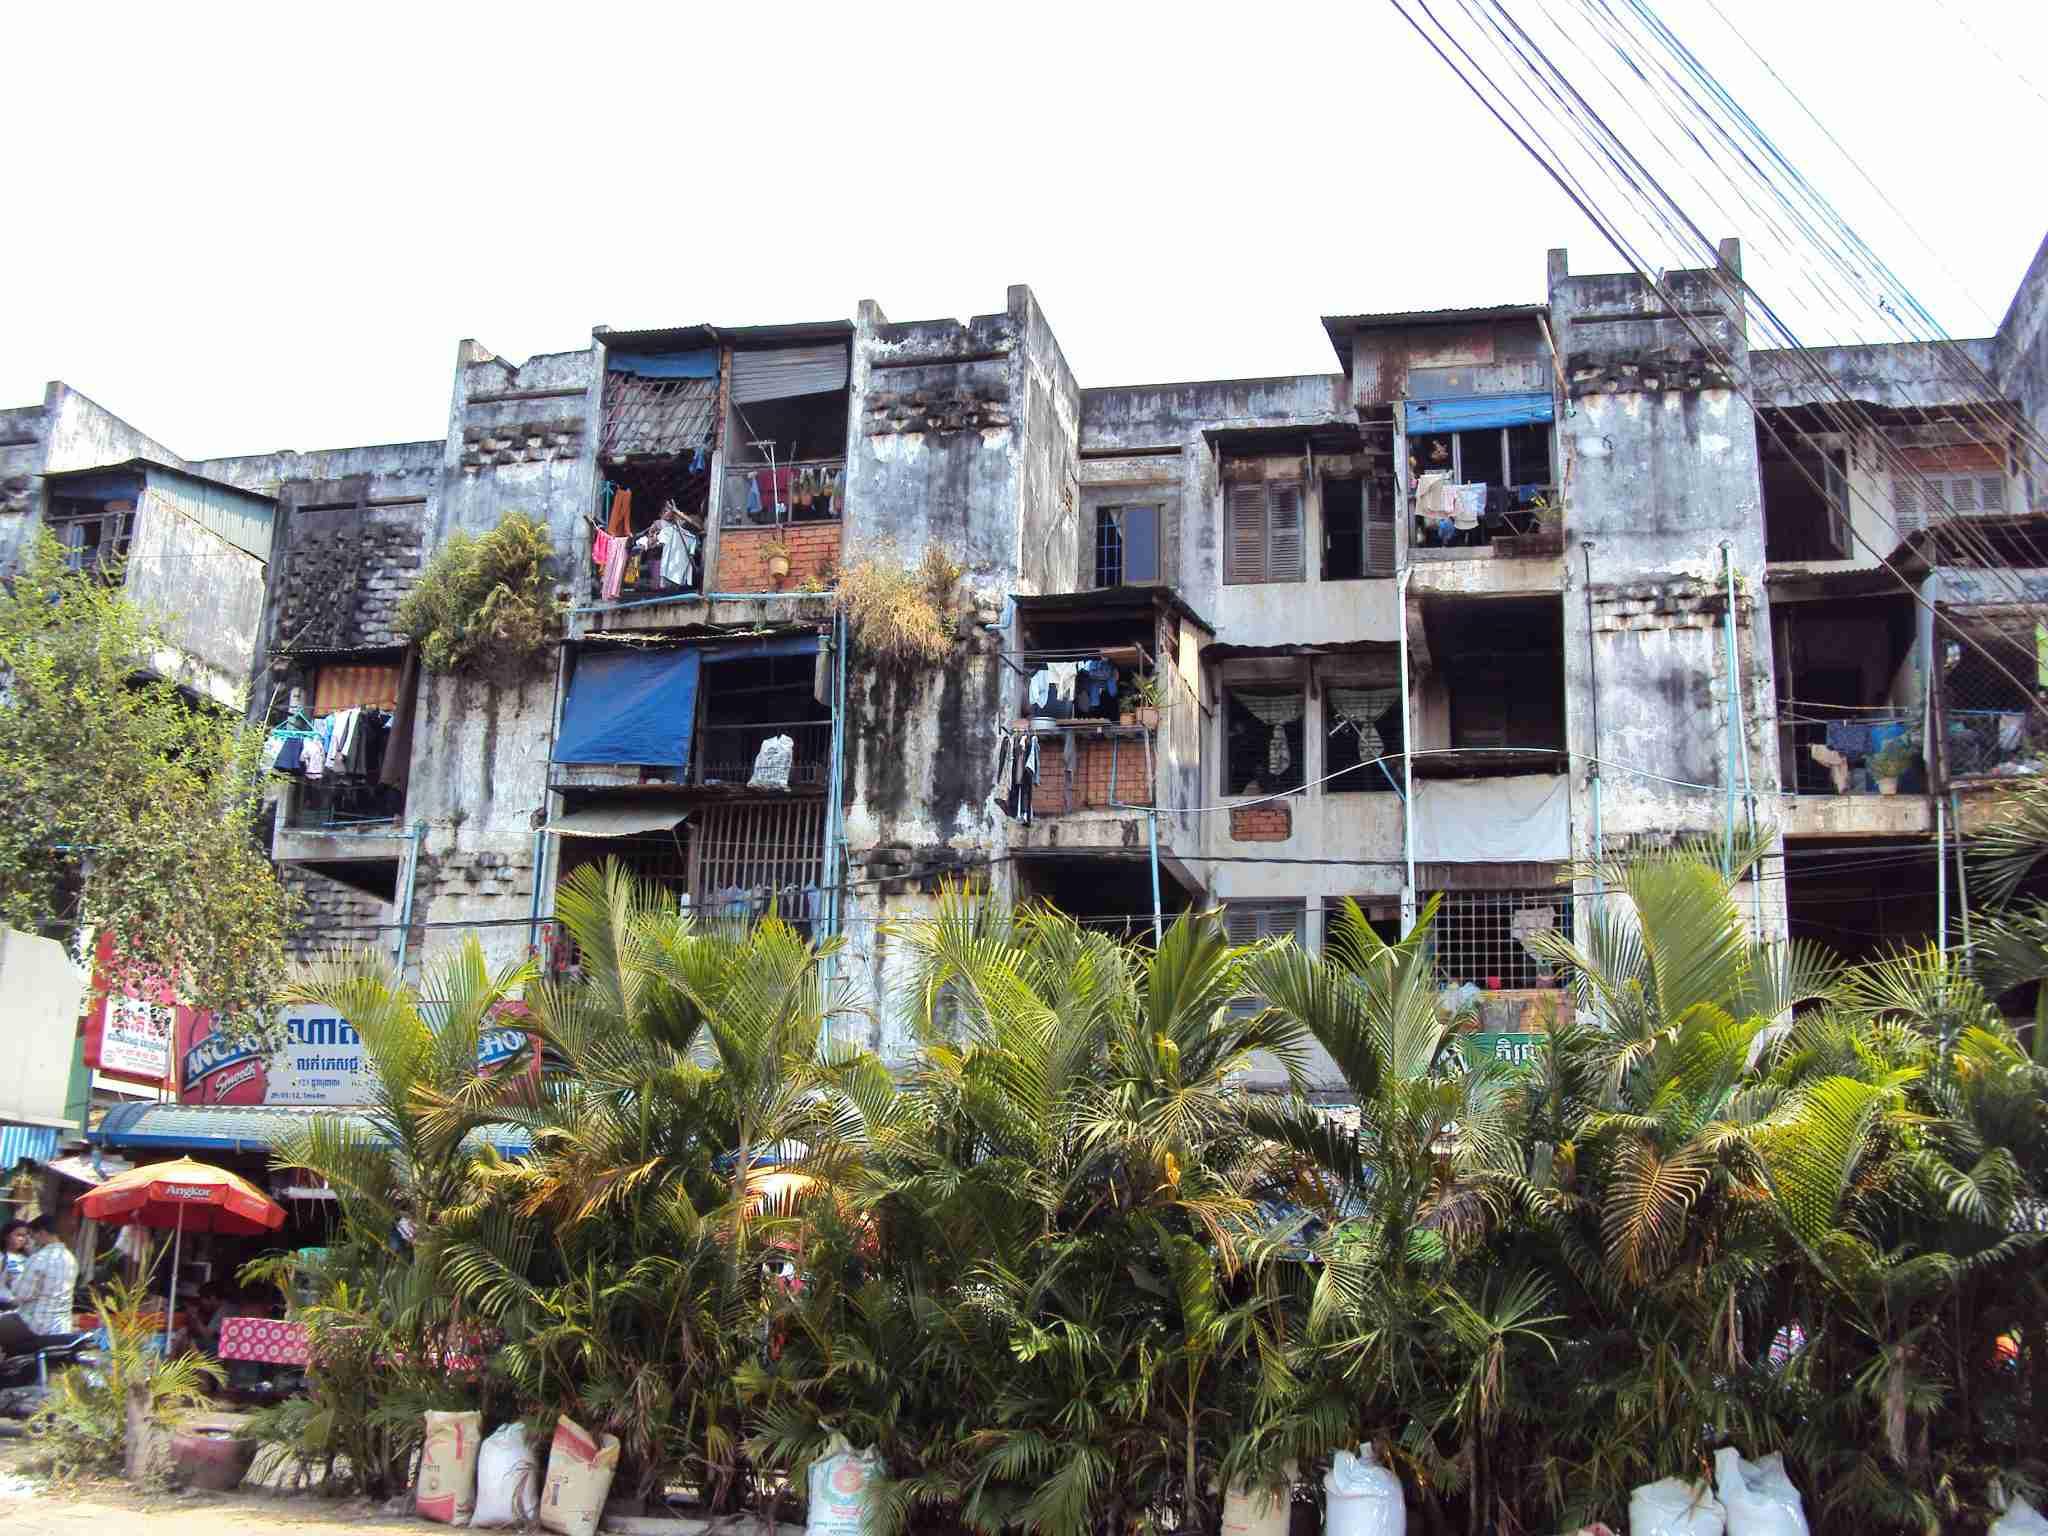 Houses in Phnom Penh